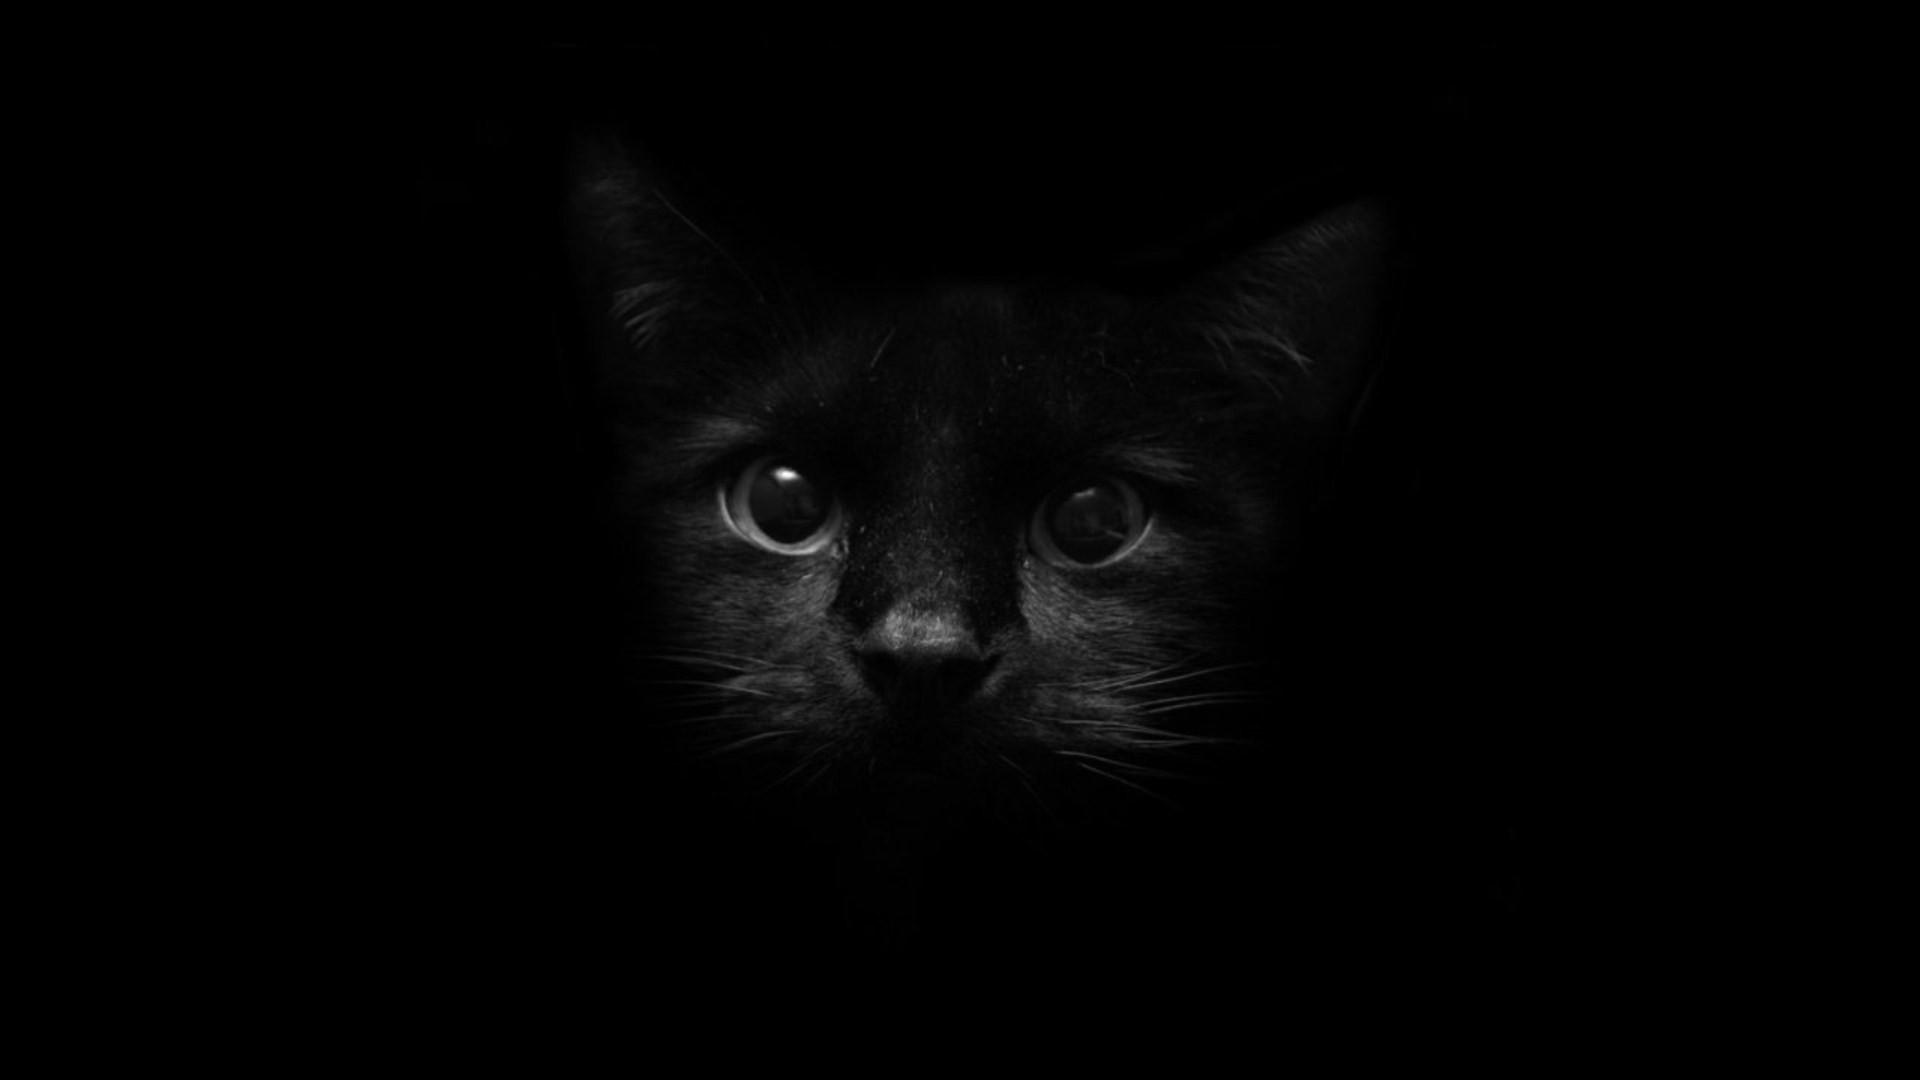 Black Cat 1080p wallpaper